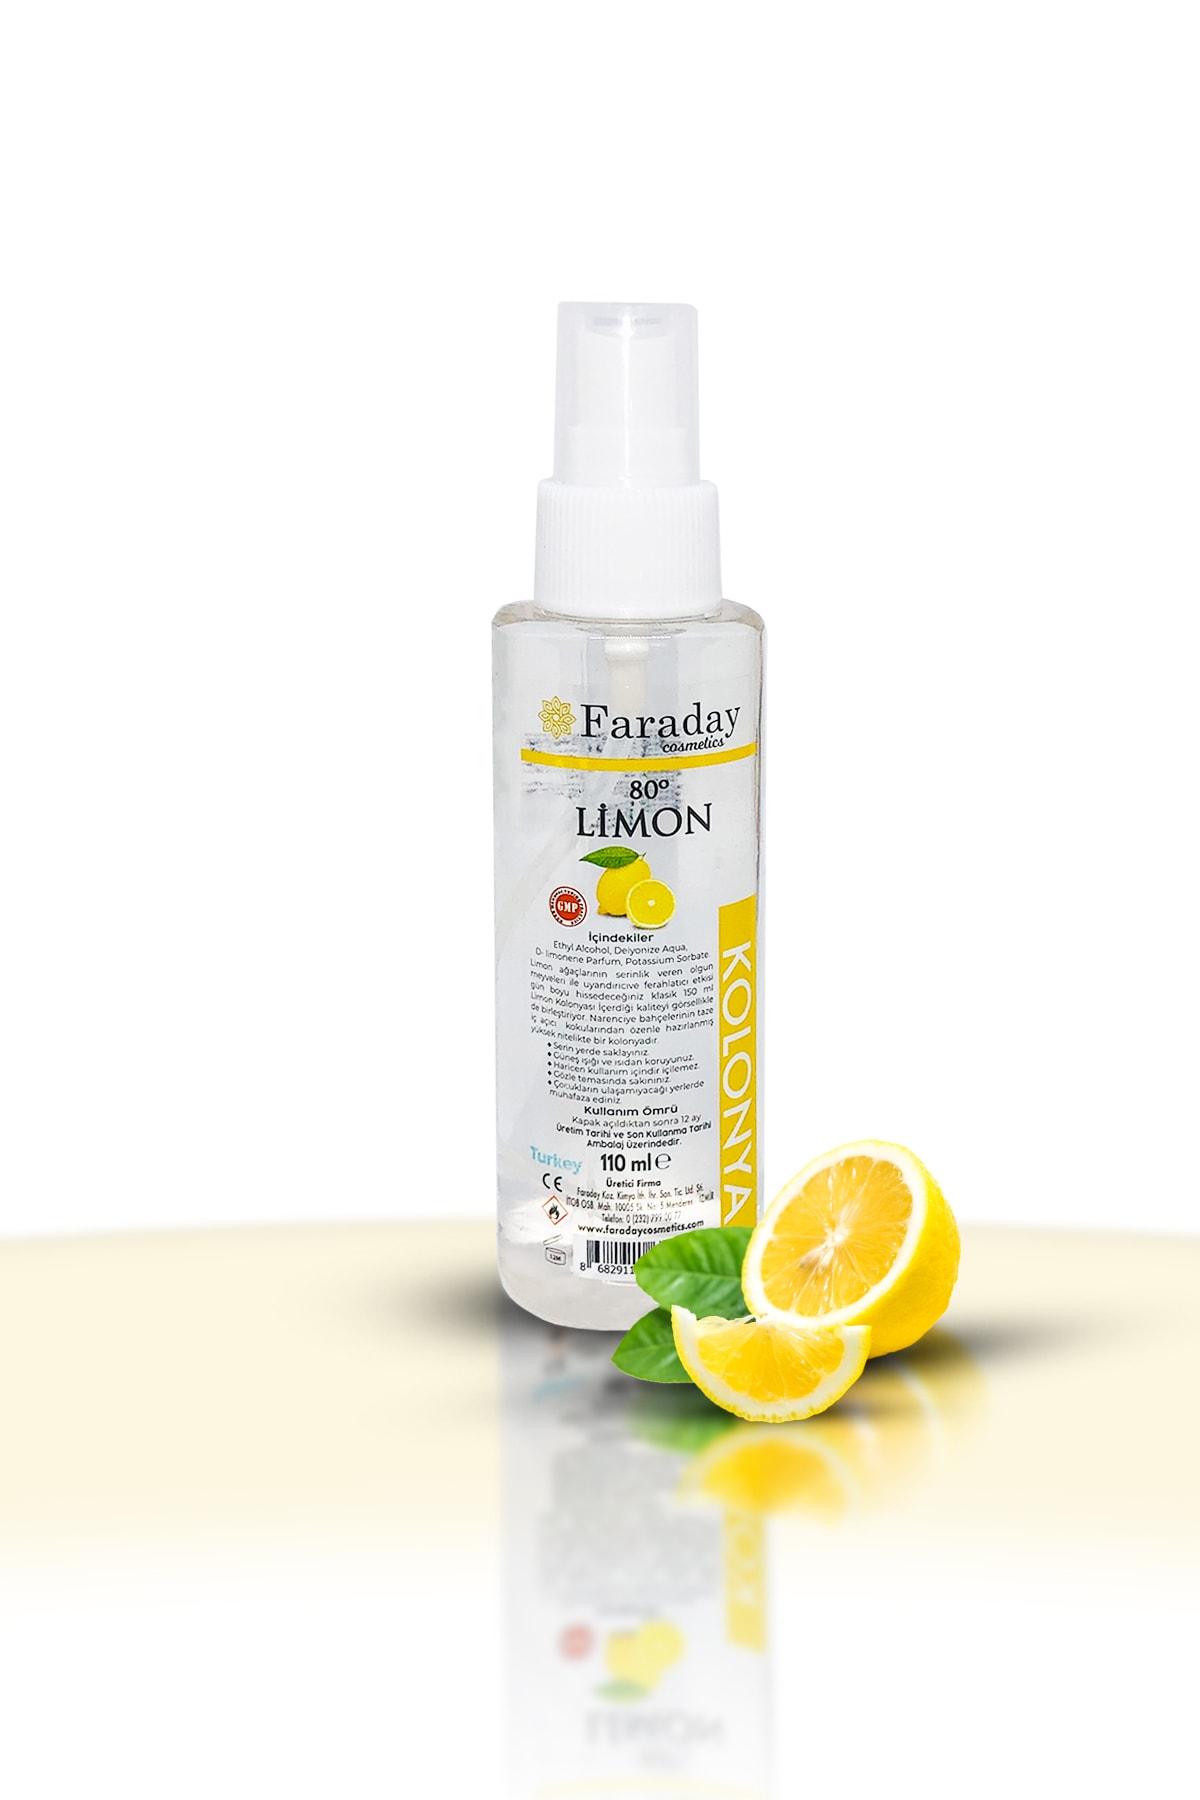 Faraday Cosmetics Yüksek Nitelikli Limon Kolonyası - 80 Derece - 110 Ml 1